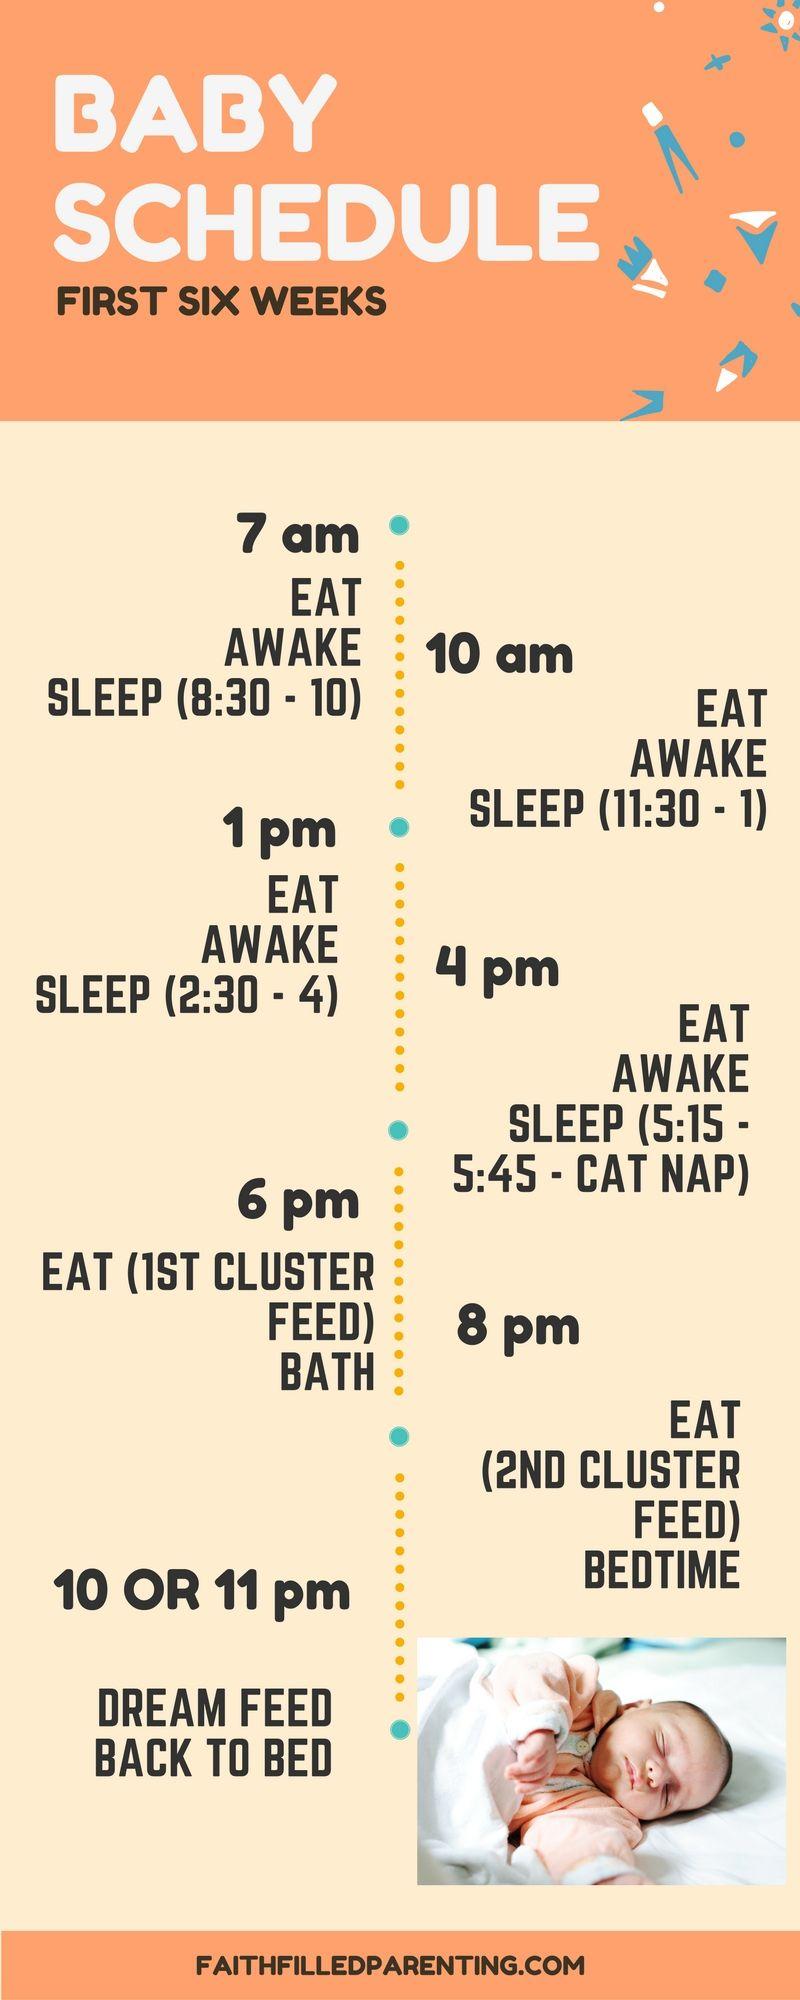 4 baby sleep schedules that work | baby sleep schedule, sleep